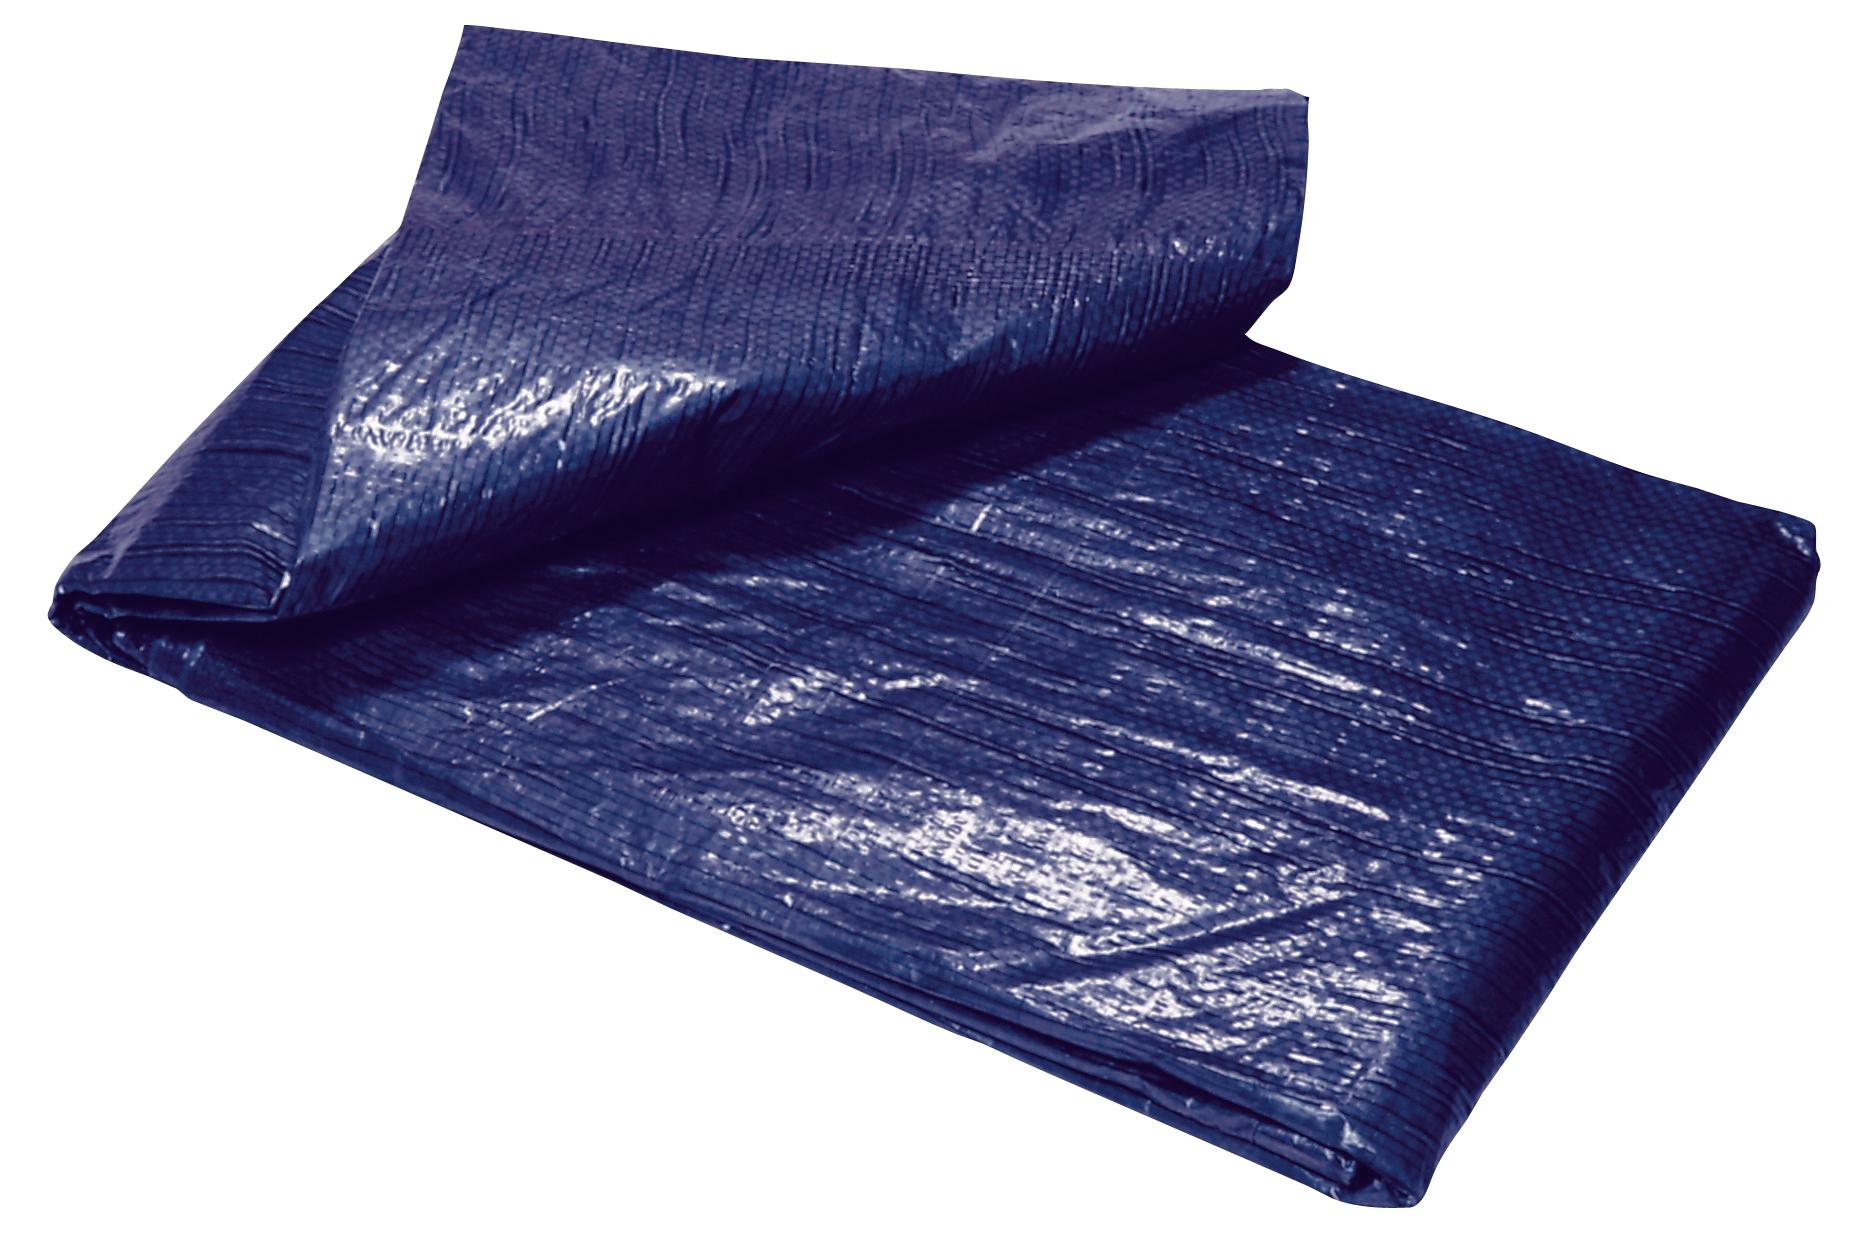 Plachta Tarpaulin Standard 06x10, prekrývacia, 80 g/m2, modrá